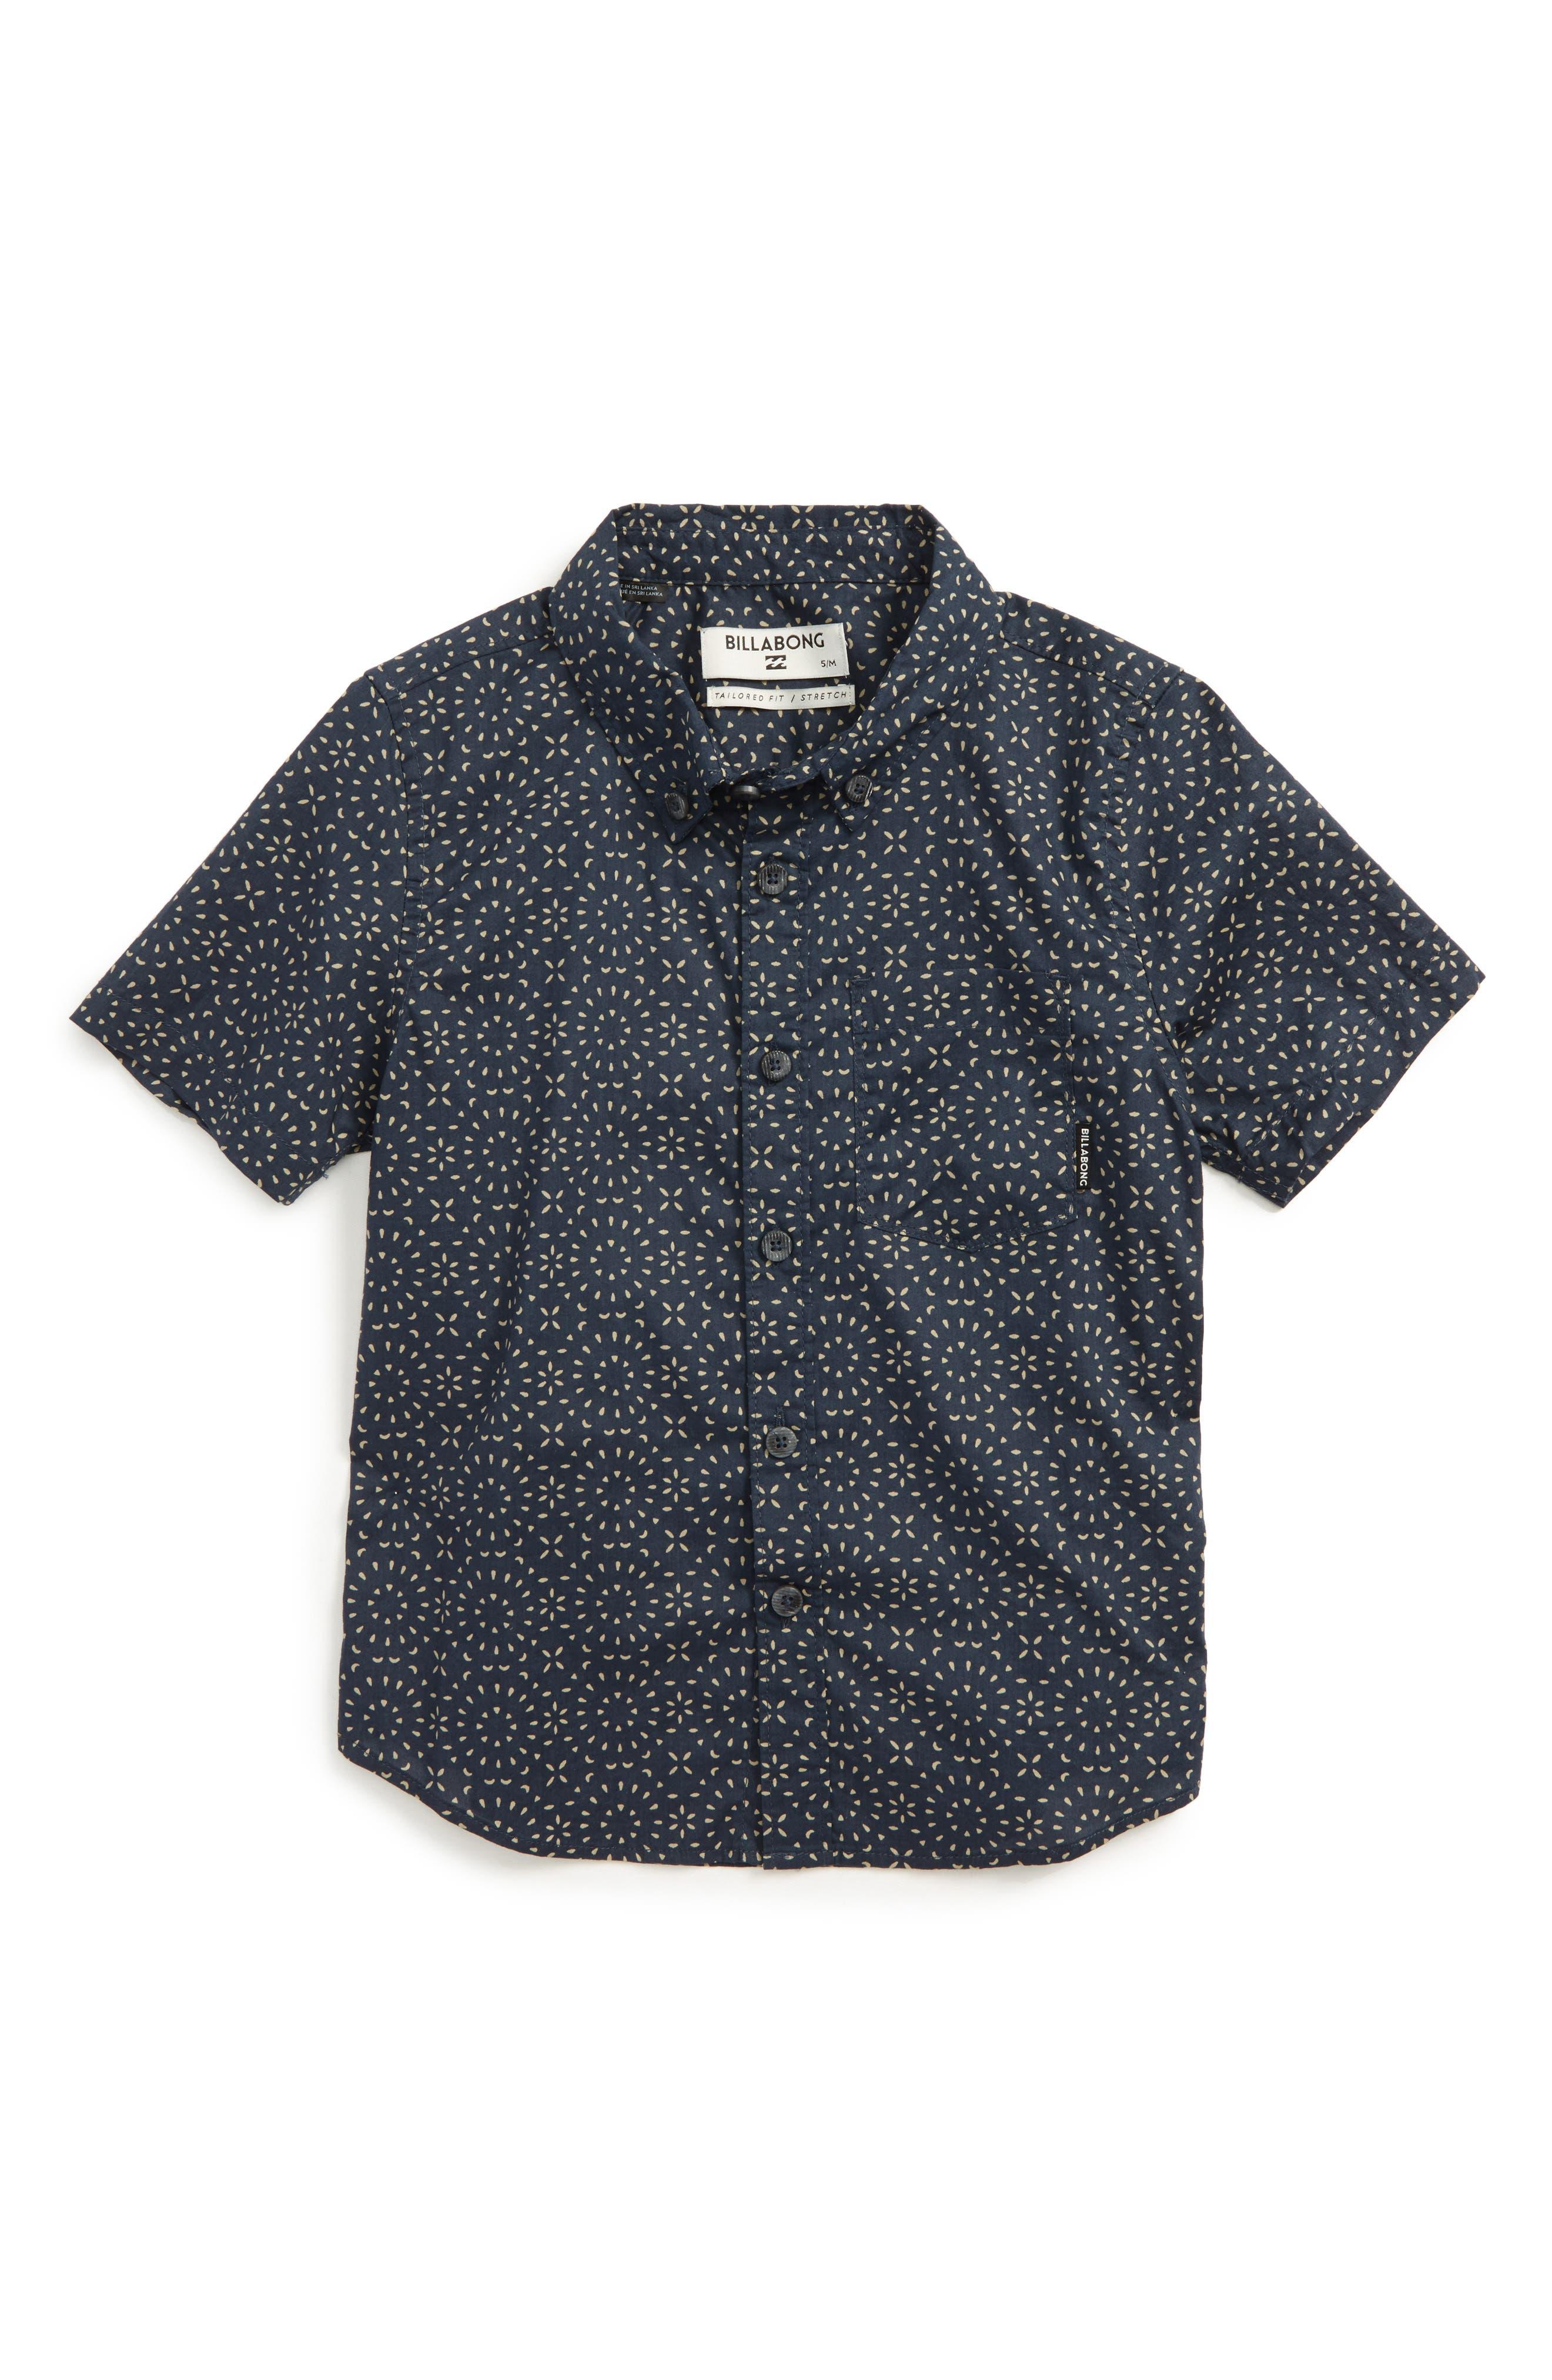 Billabong Sundays Mini Woven Shirt (Little Boys)